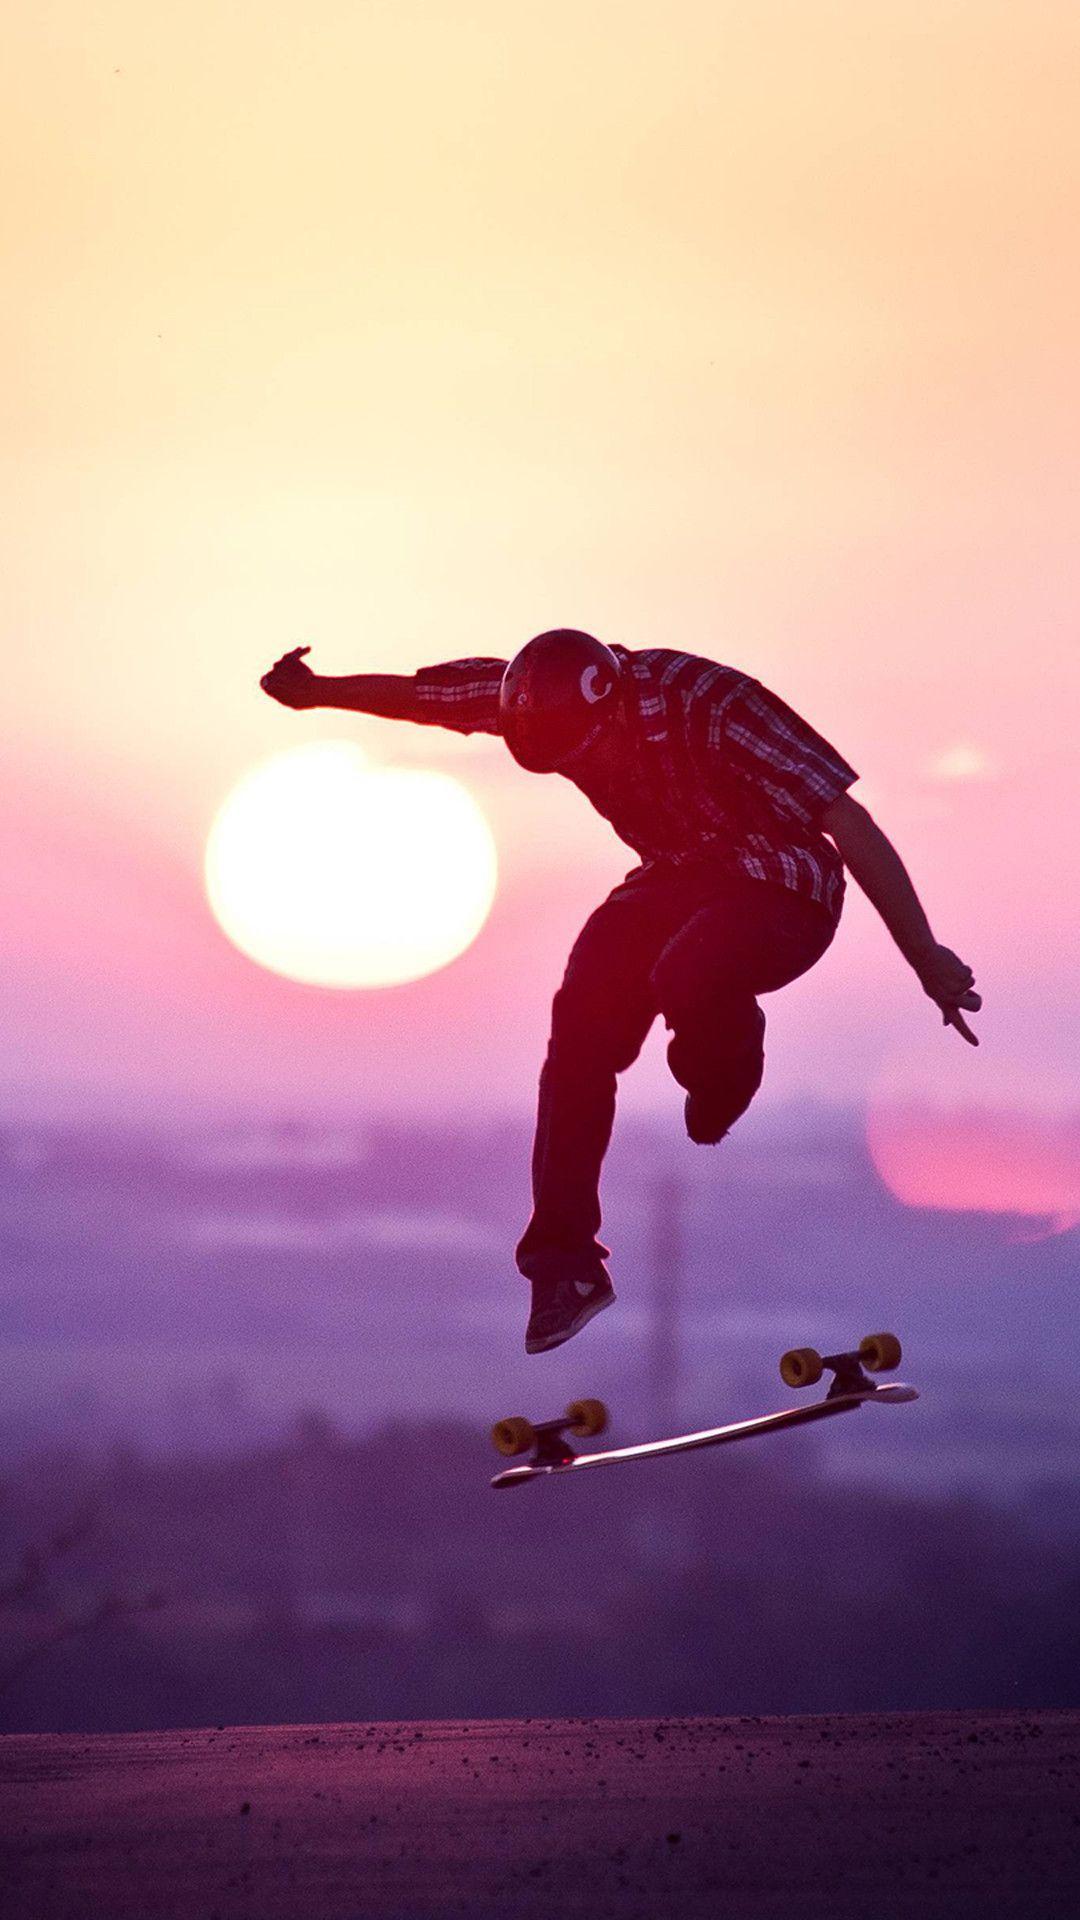 Skateboard iPhone Wallpapers   Top Skateboard iPhone 1080x1920